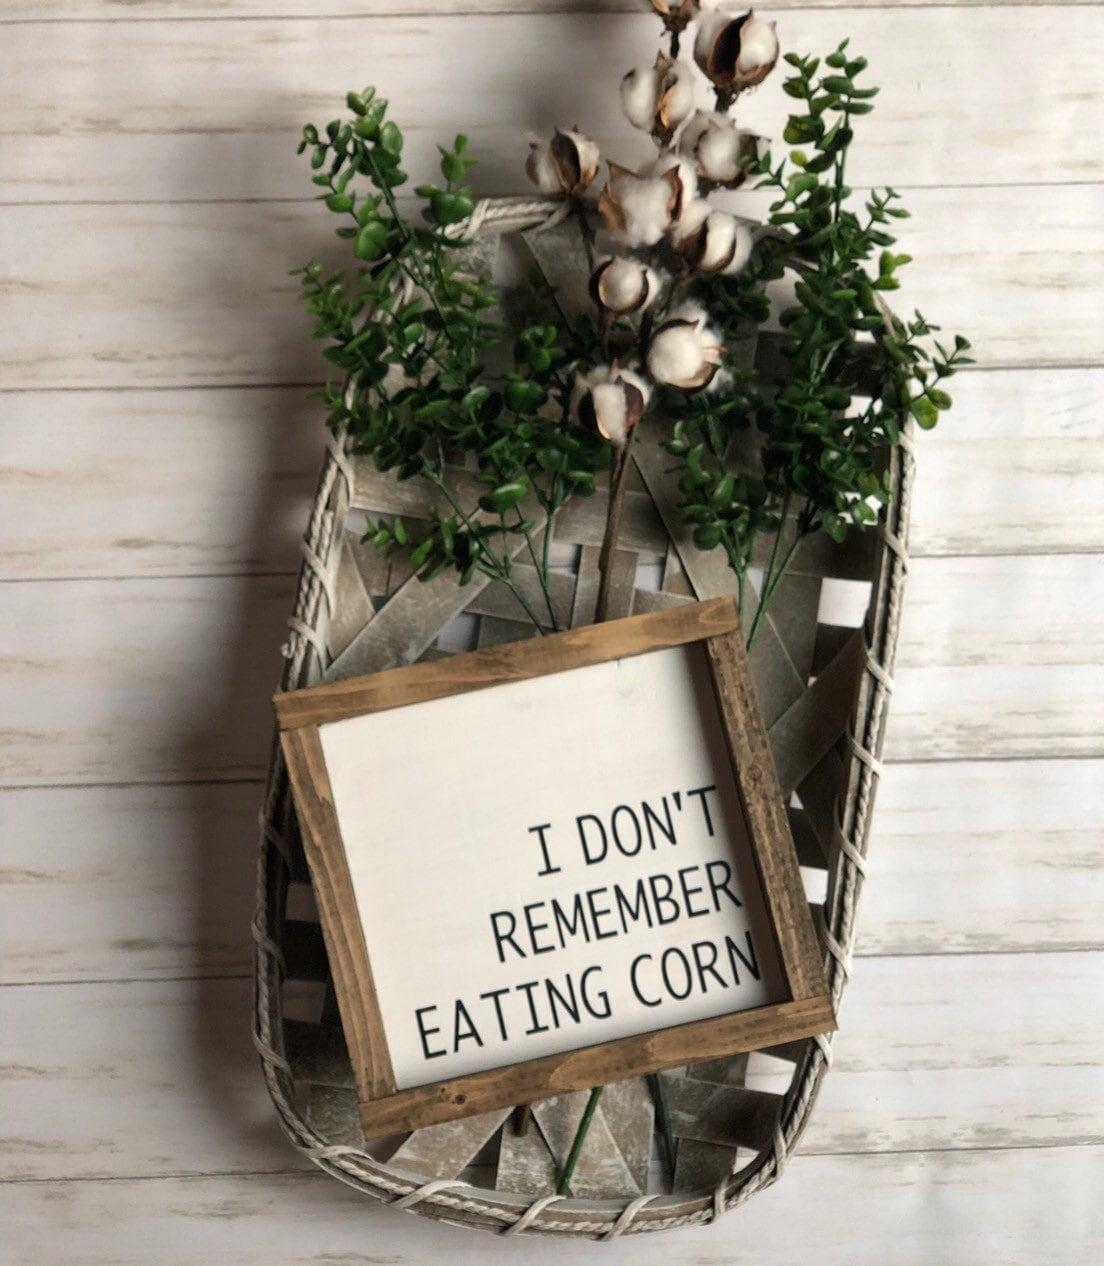 I don't remember eating corn, I don't remember eating corn bathroom